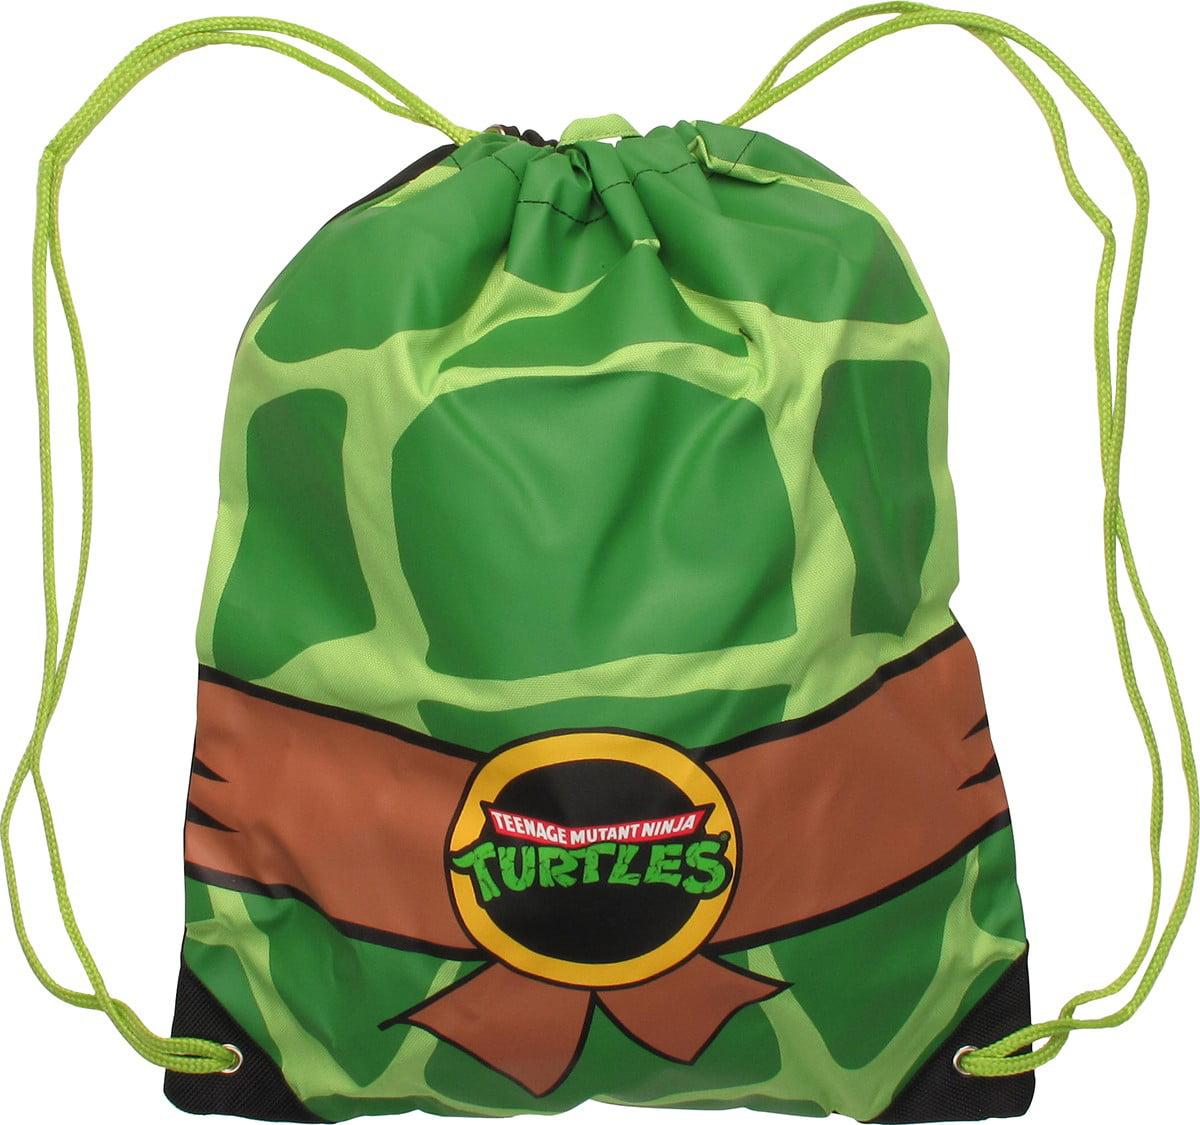 Teenage Mutant Ninja Turtles Green Drawstring Backpack